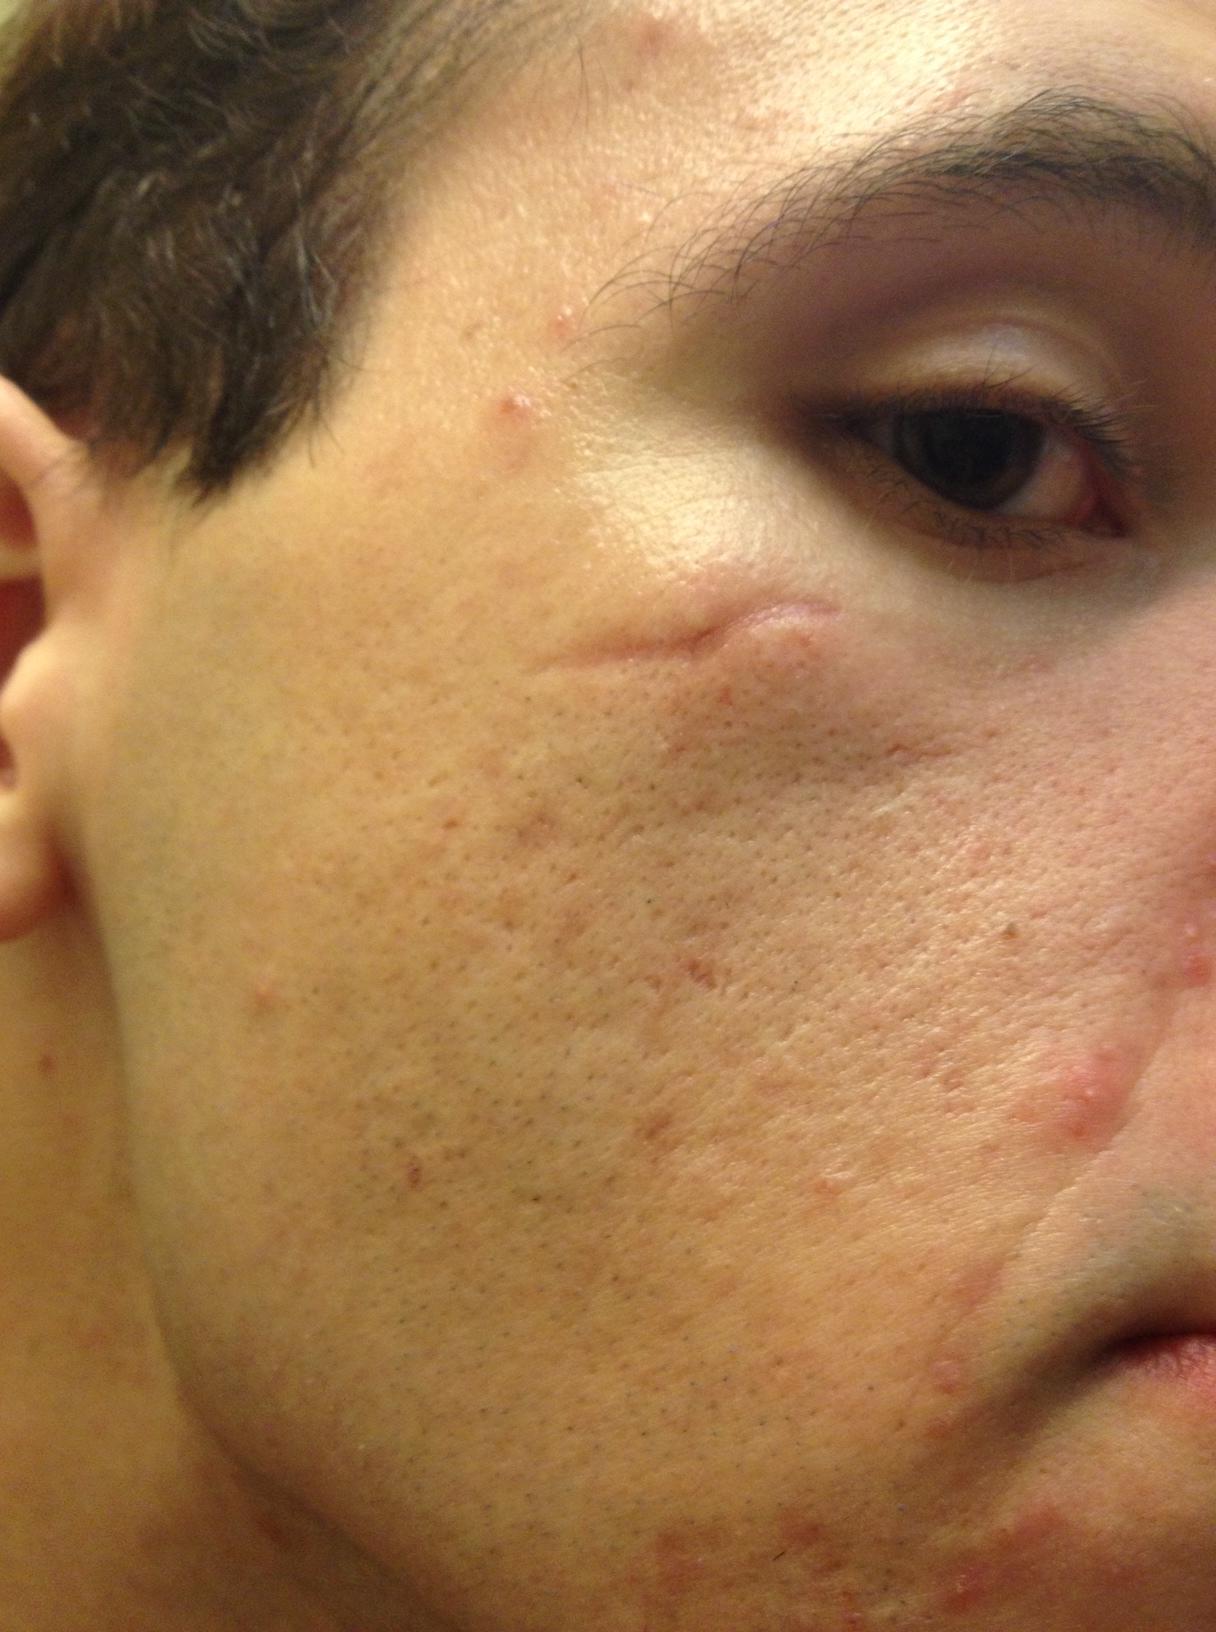 Facial laceration suture